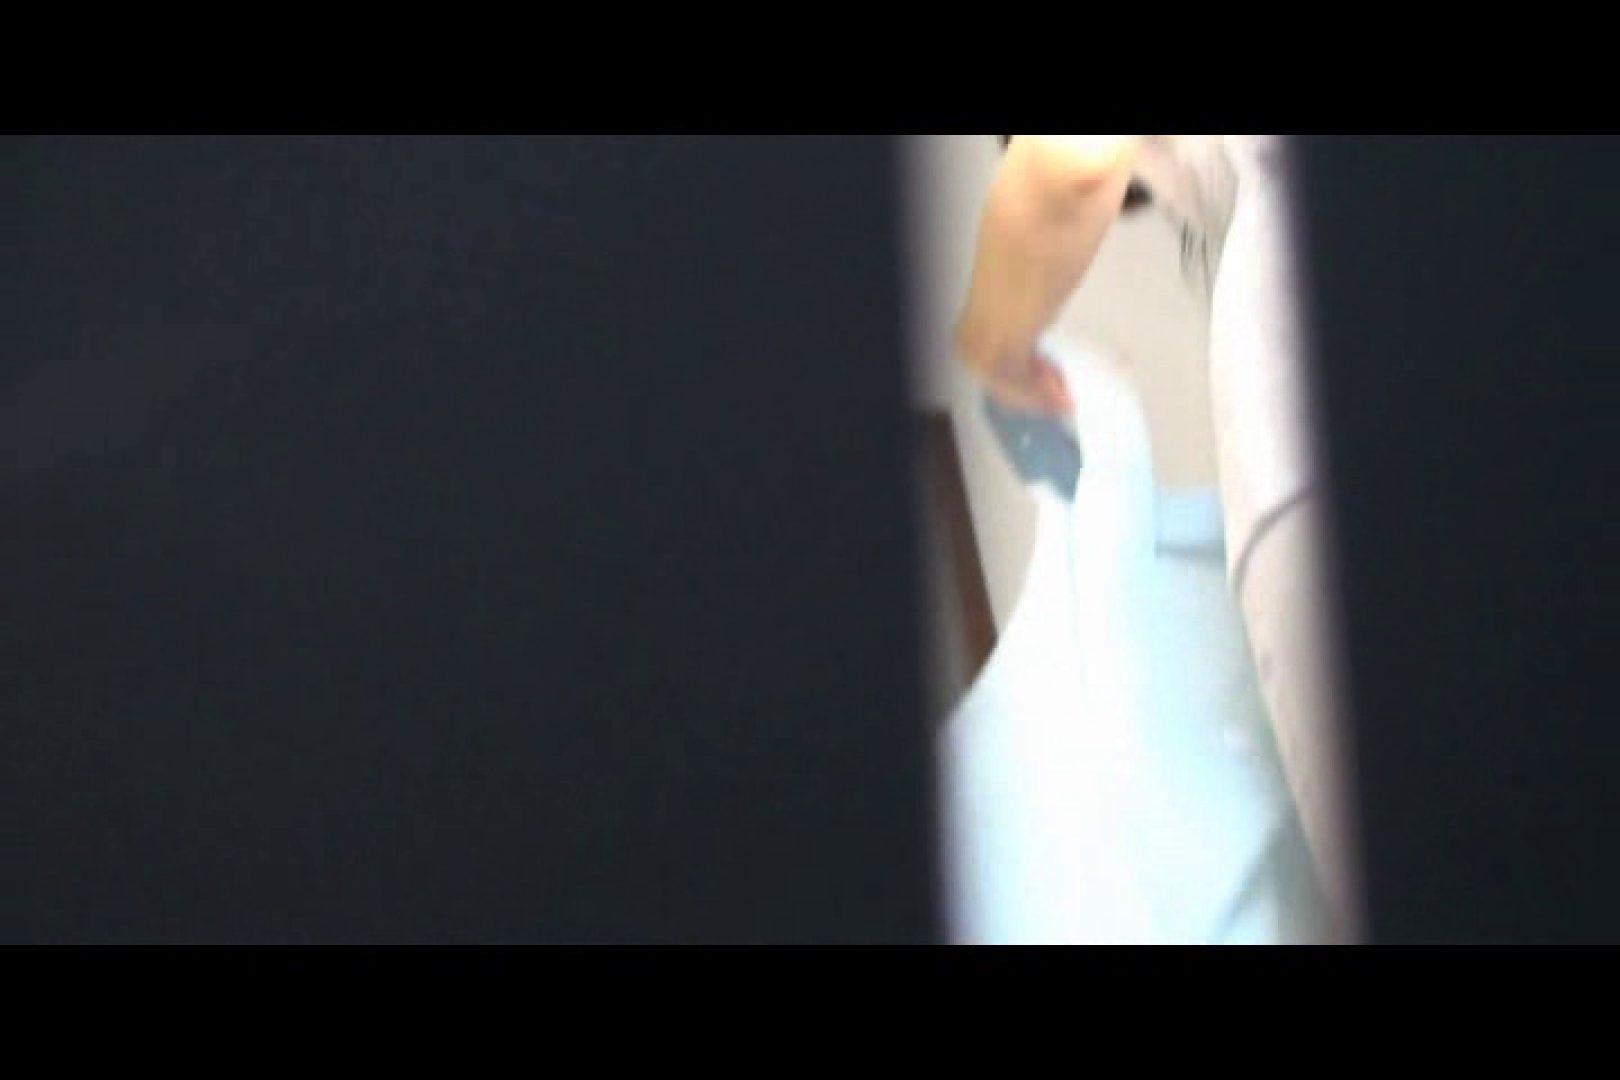 独占配信!無修正! 看護女子寮 vol.07 シャワー スケベ動画紹介 80PIX 58